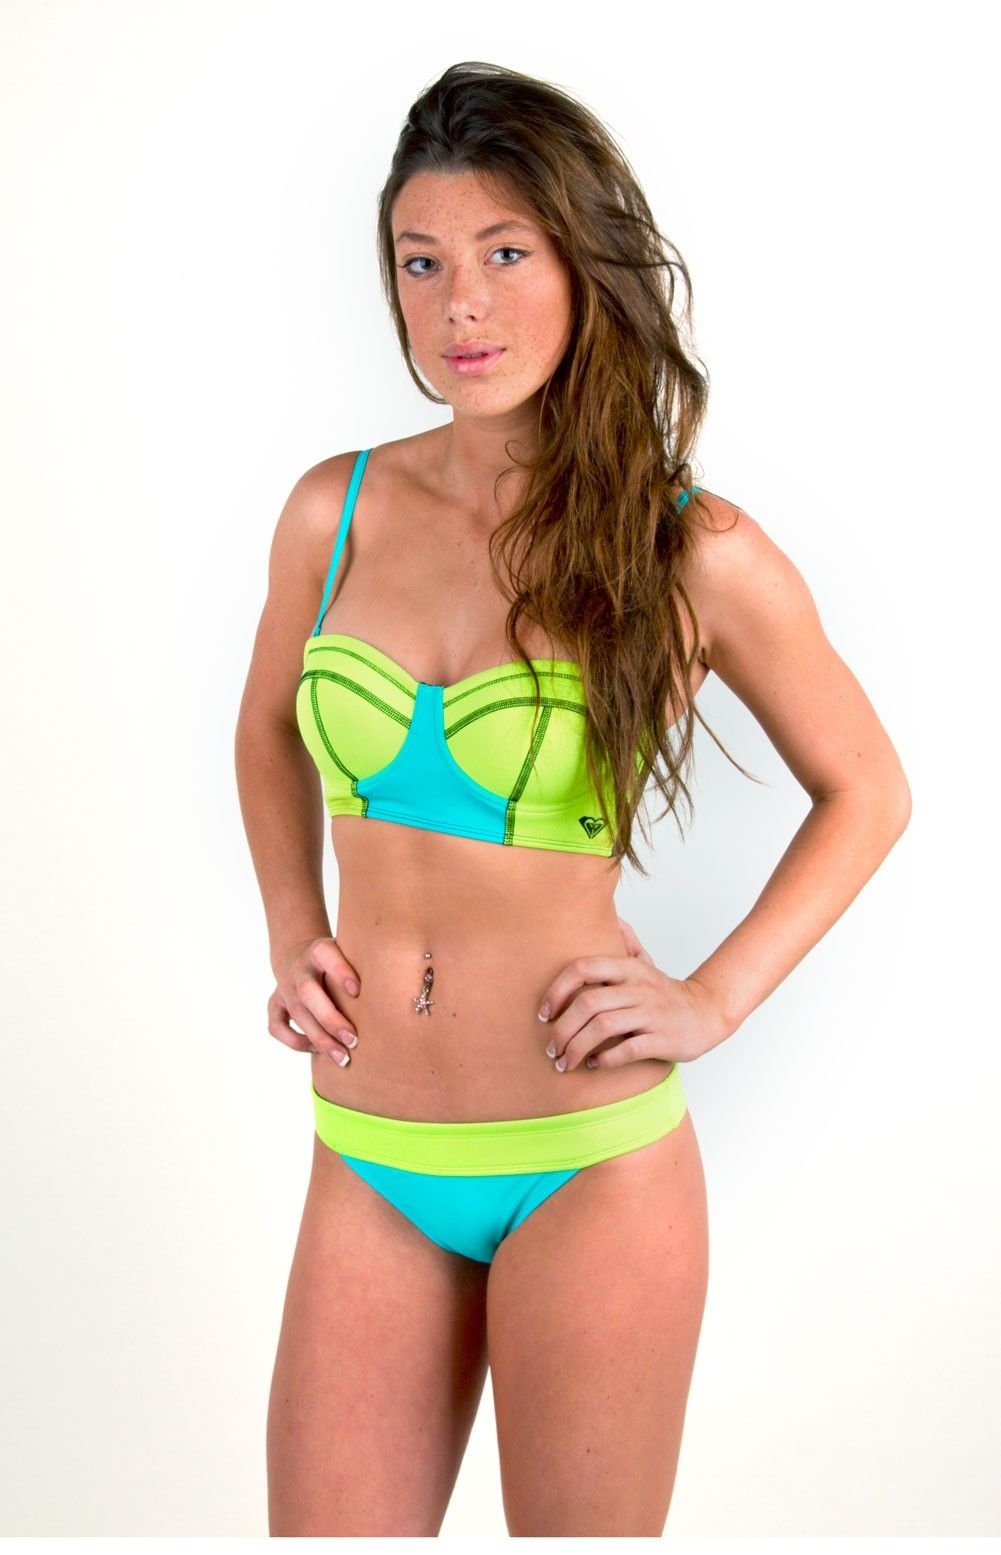 b08e4e58d7 Roxy Neon Tide Bustia Bandeau Bikini Top